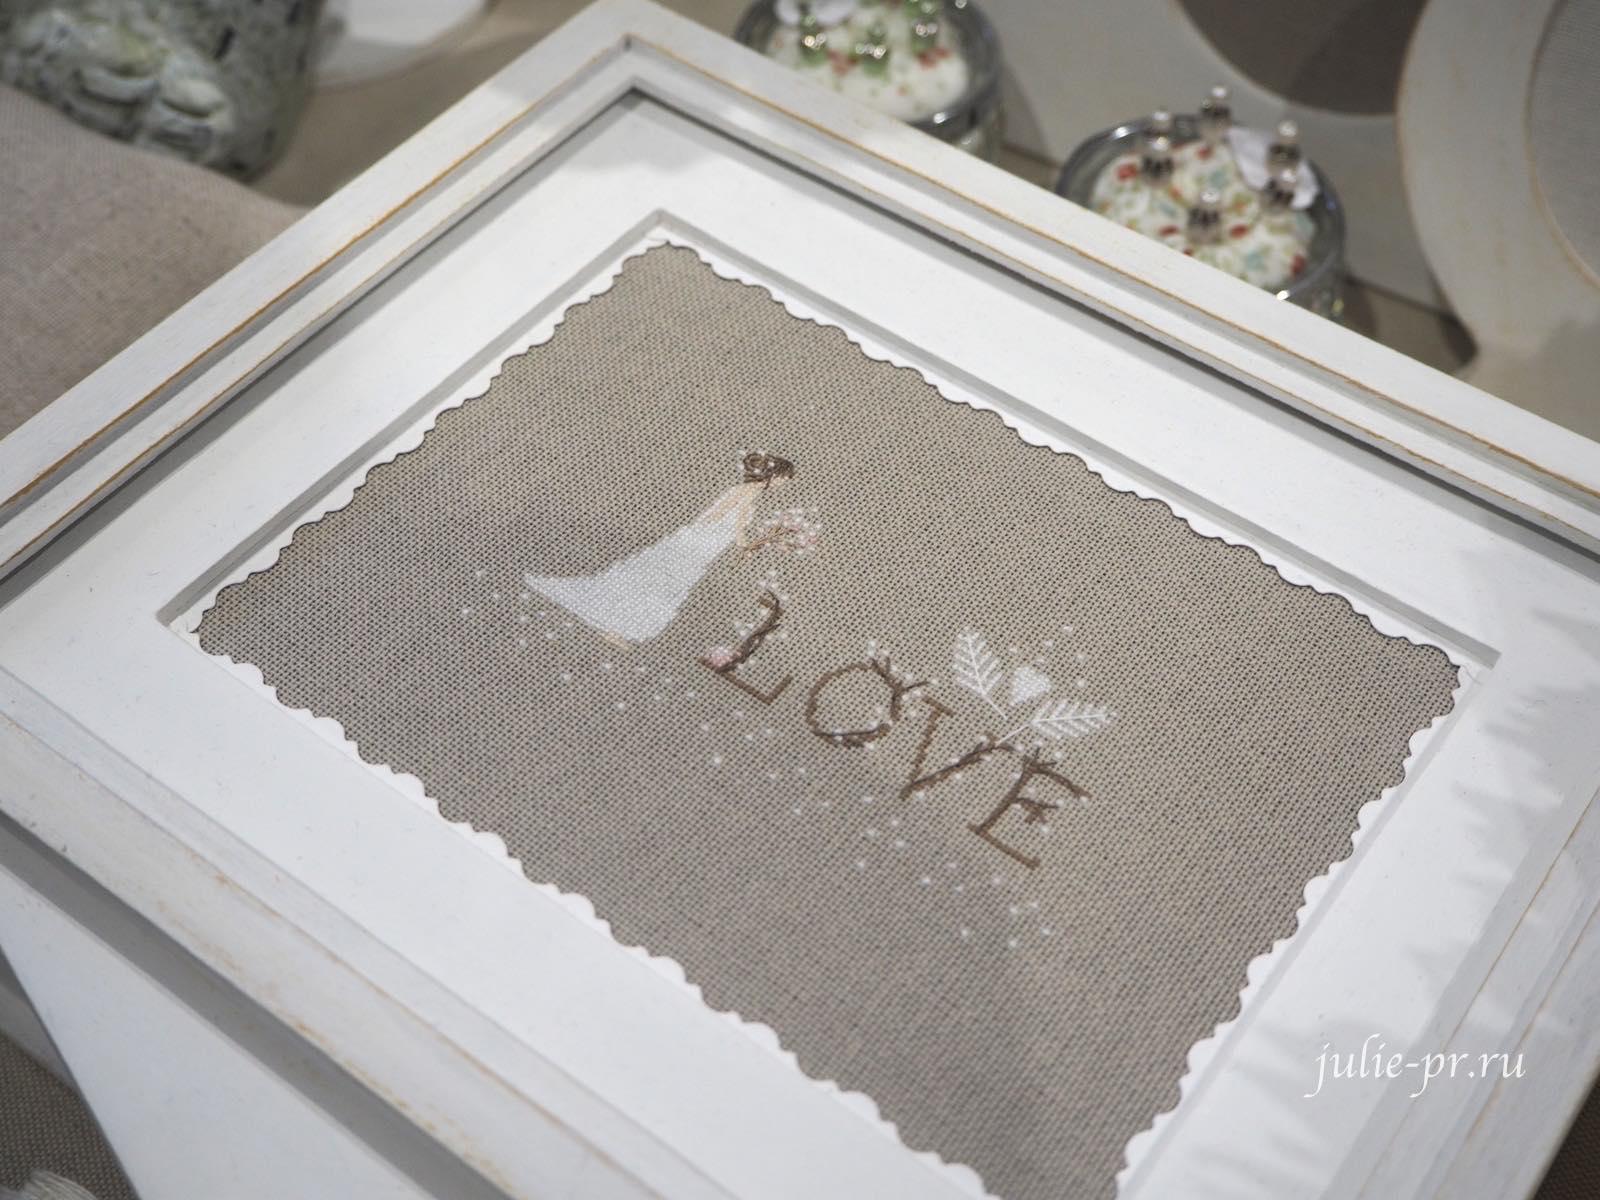 Jennifer Lentini, Love, любовь, свадебная, вышивка крестом